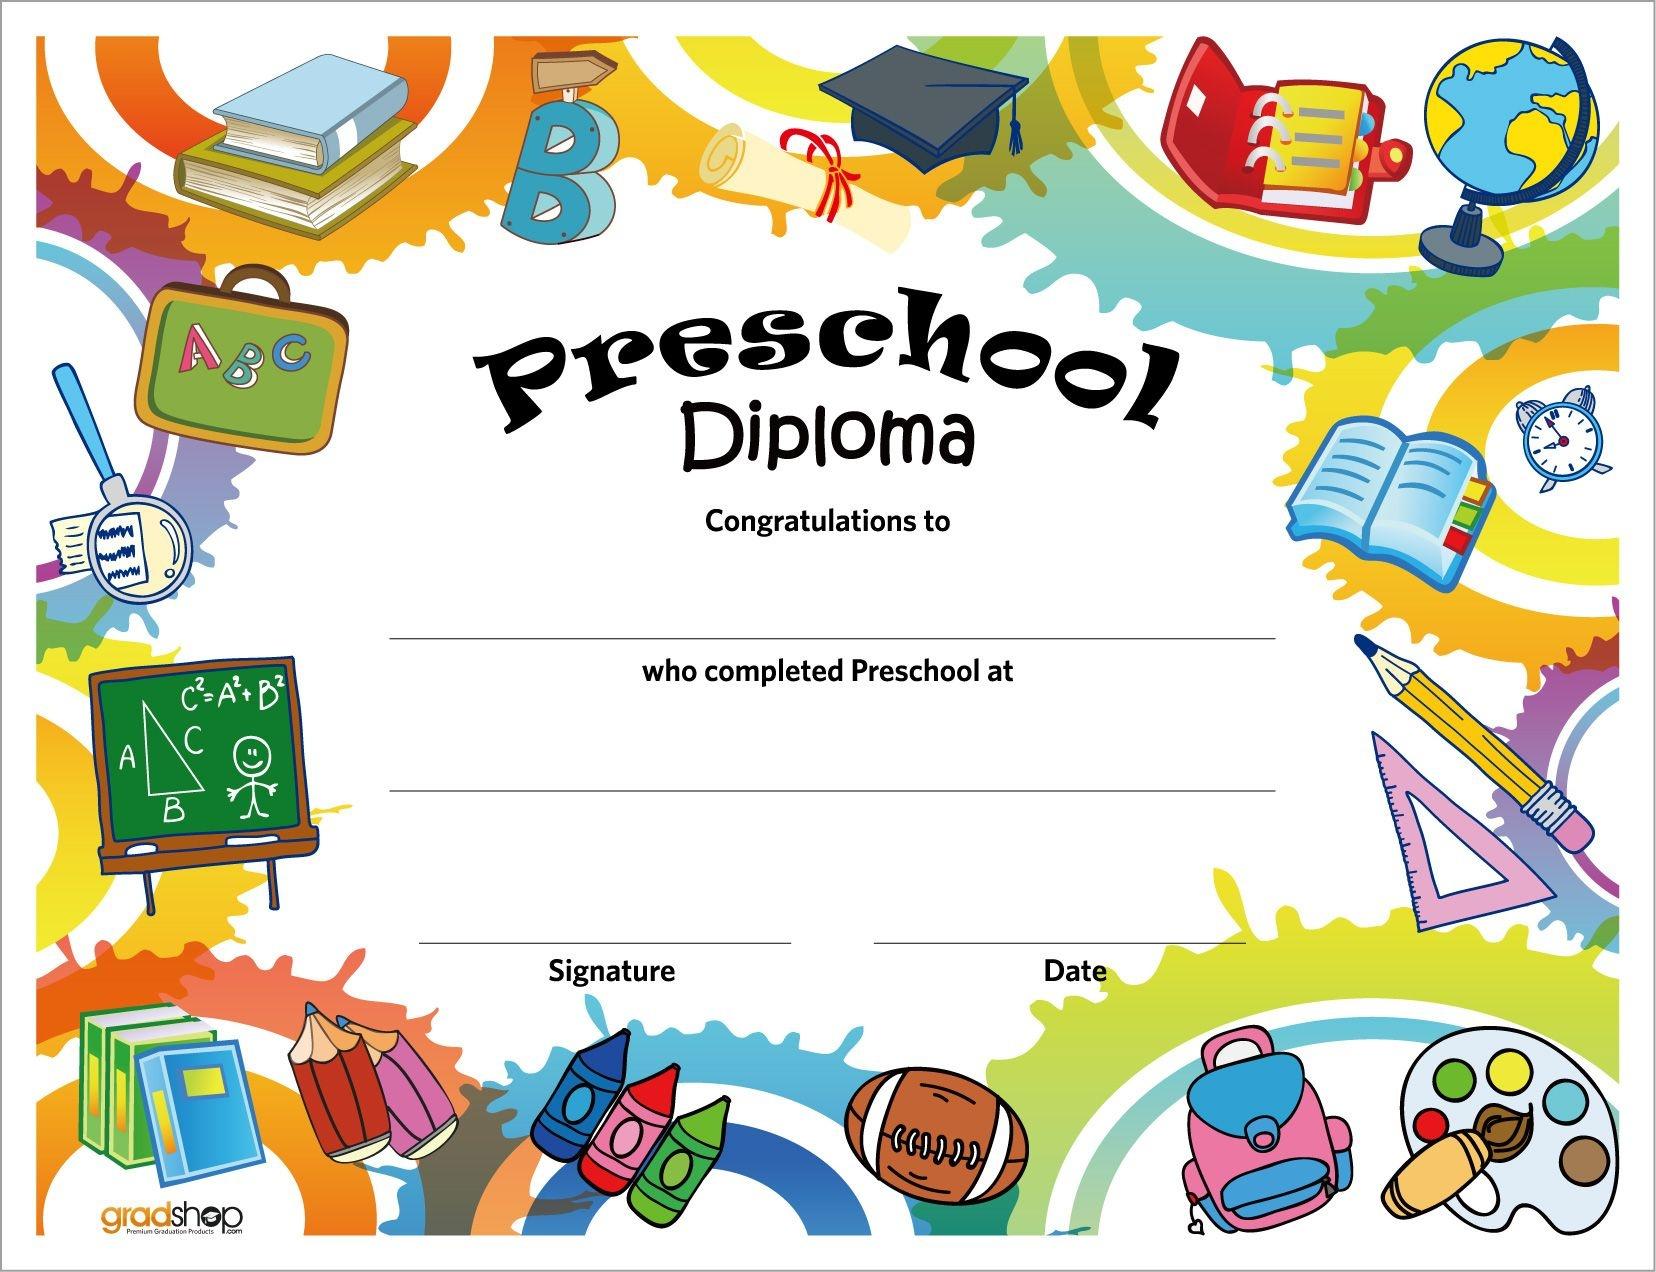 Free Printable Preschool Diplomas | Preschool Classroom - Preschool Graduation Diploma Free Printable